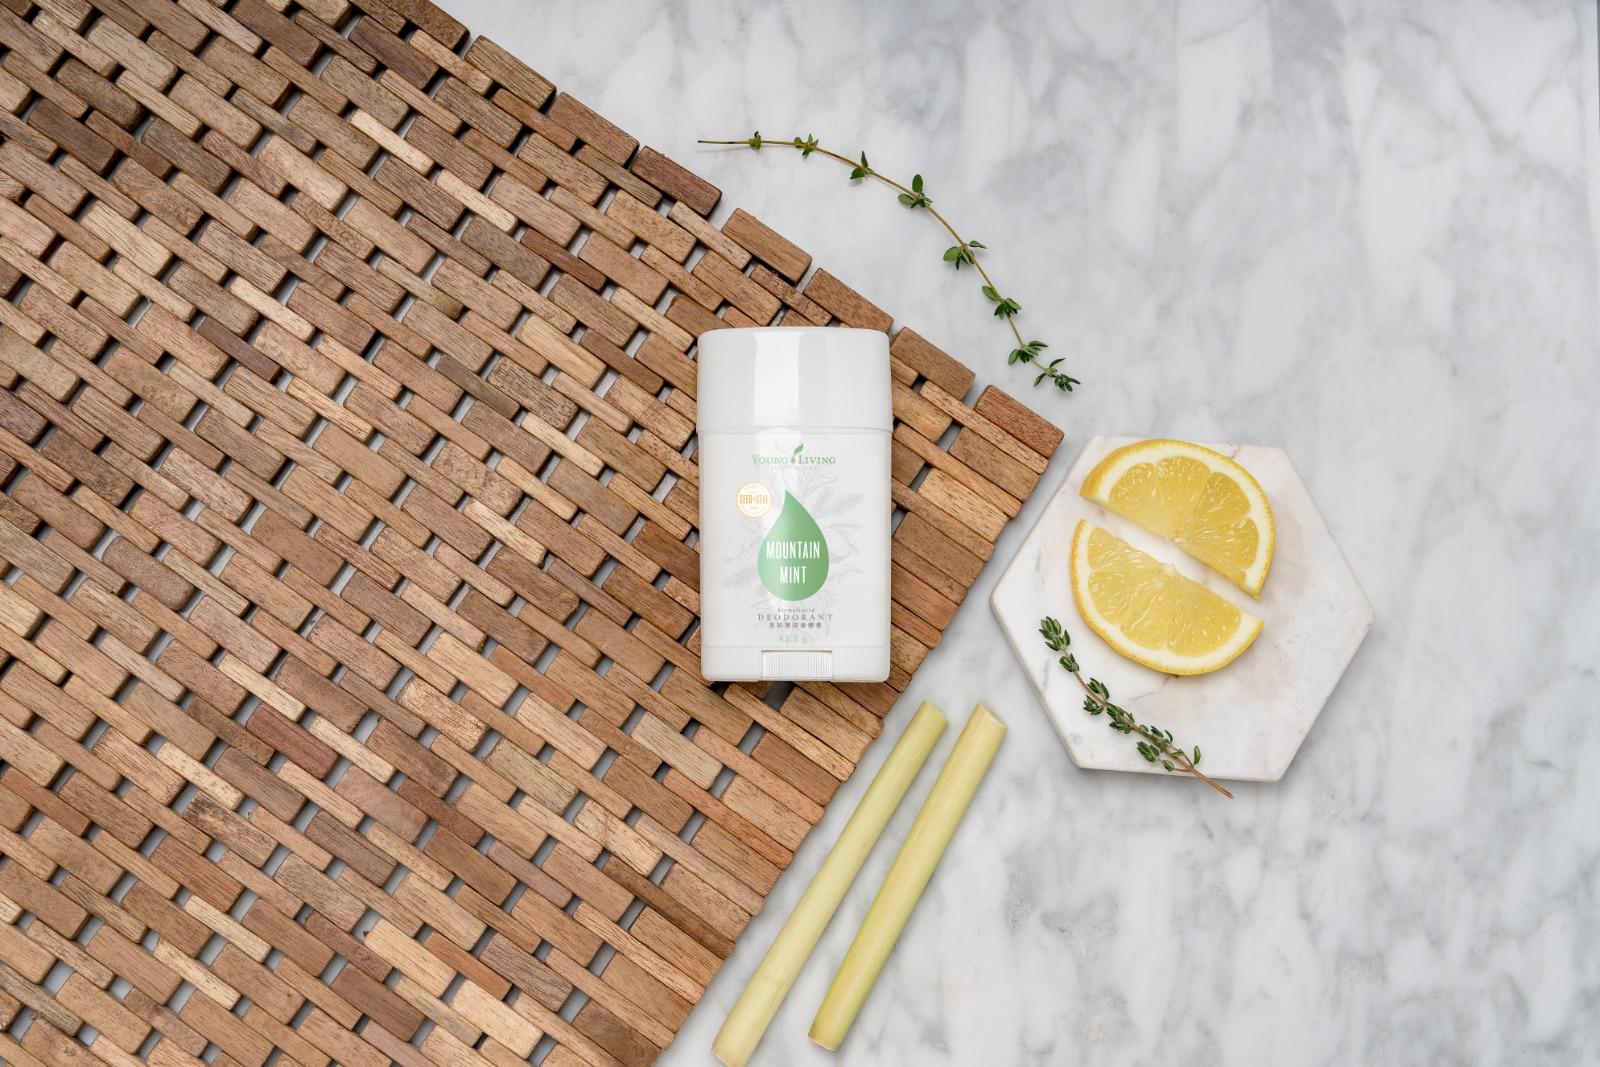 YOUNG LIVING 香體膏 HK$151/42.5g 香體膏不含鋁鹽,由椰子油、蜂蠟、維他命E配方而成,並揉合多種精油,包括檸檬、迷迭香等,有助舒緩肌膚。